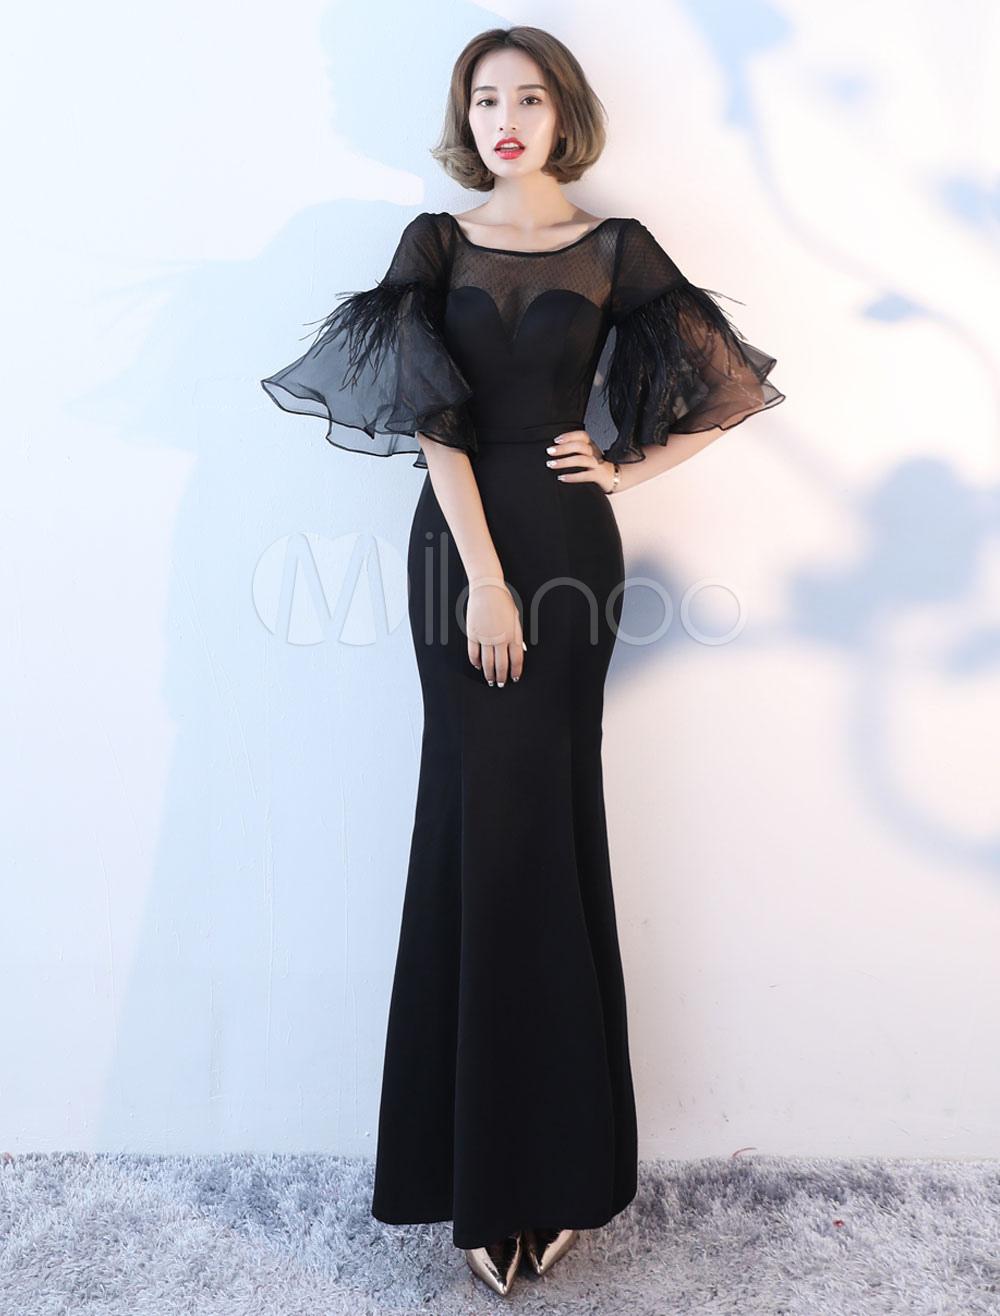 Black Evening Dresses Long Bell Sleeve Illusion Satin Mermaid Formal Dress (Wedding) photo